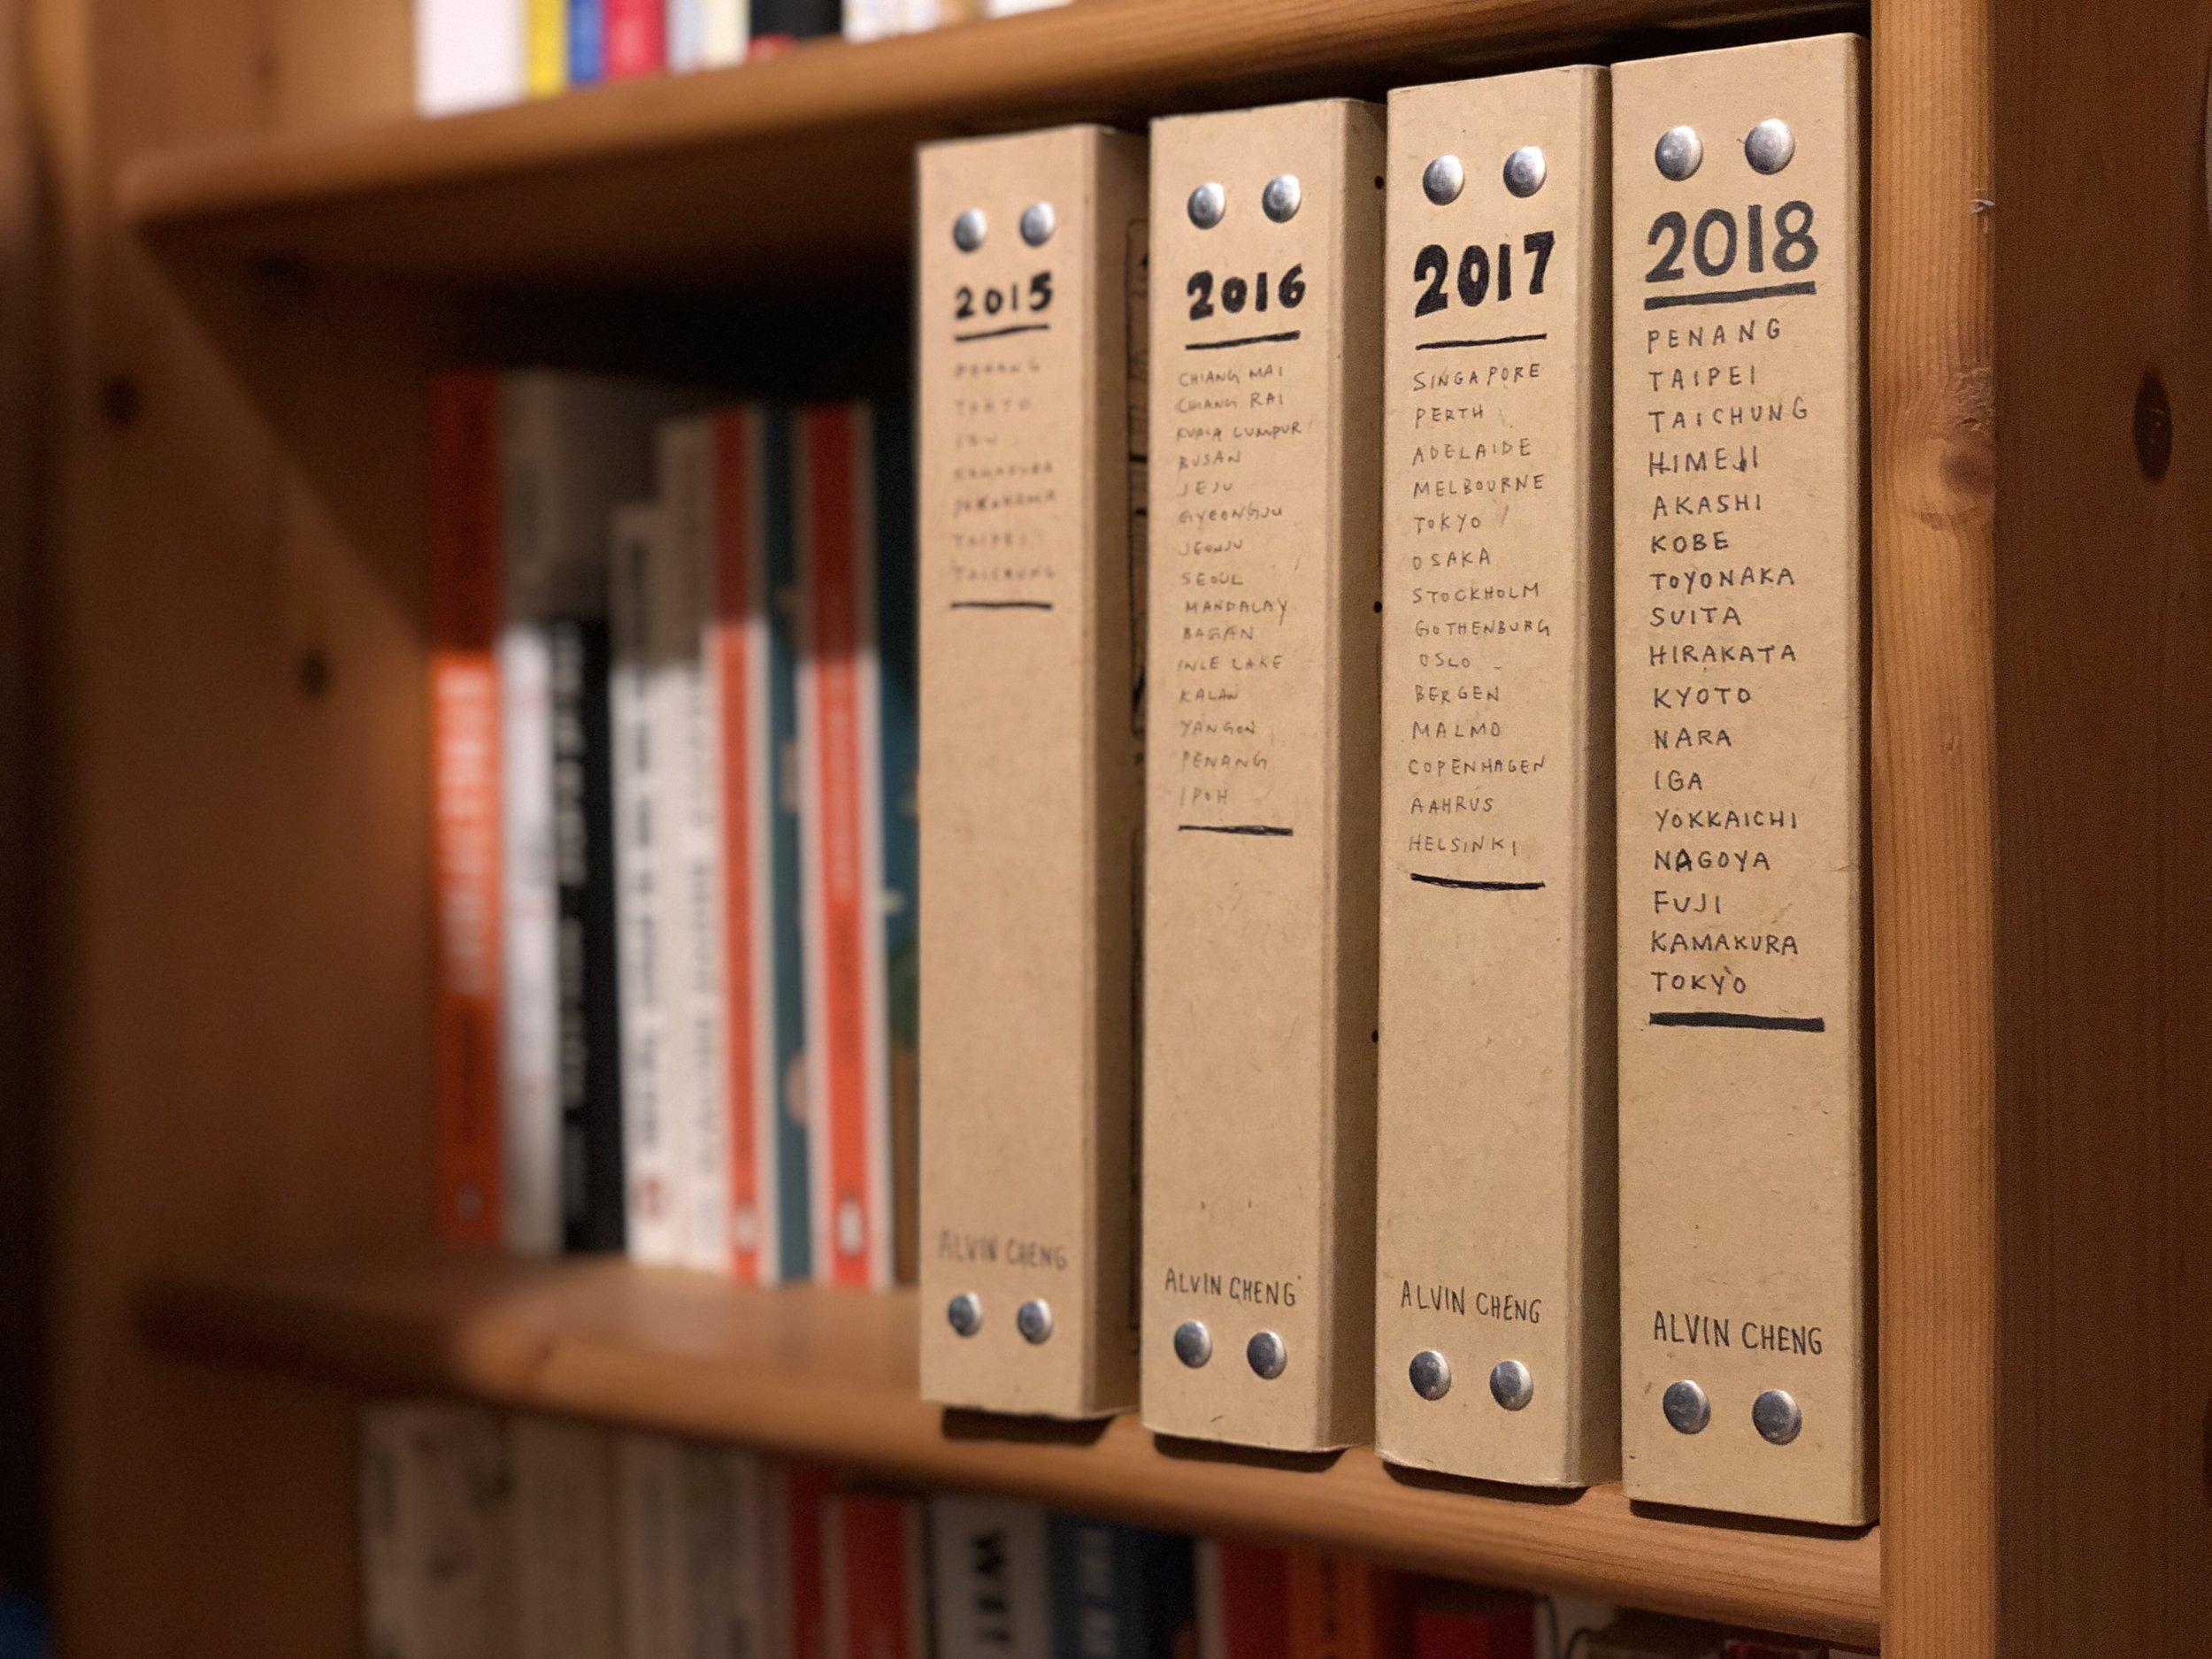 2015-2018-TN-efill-binder.jpg